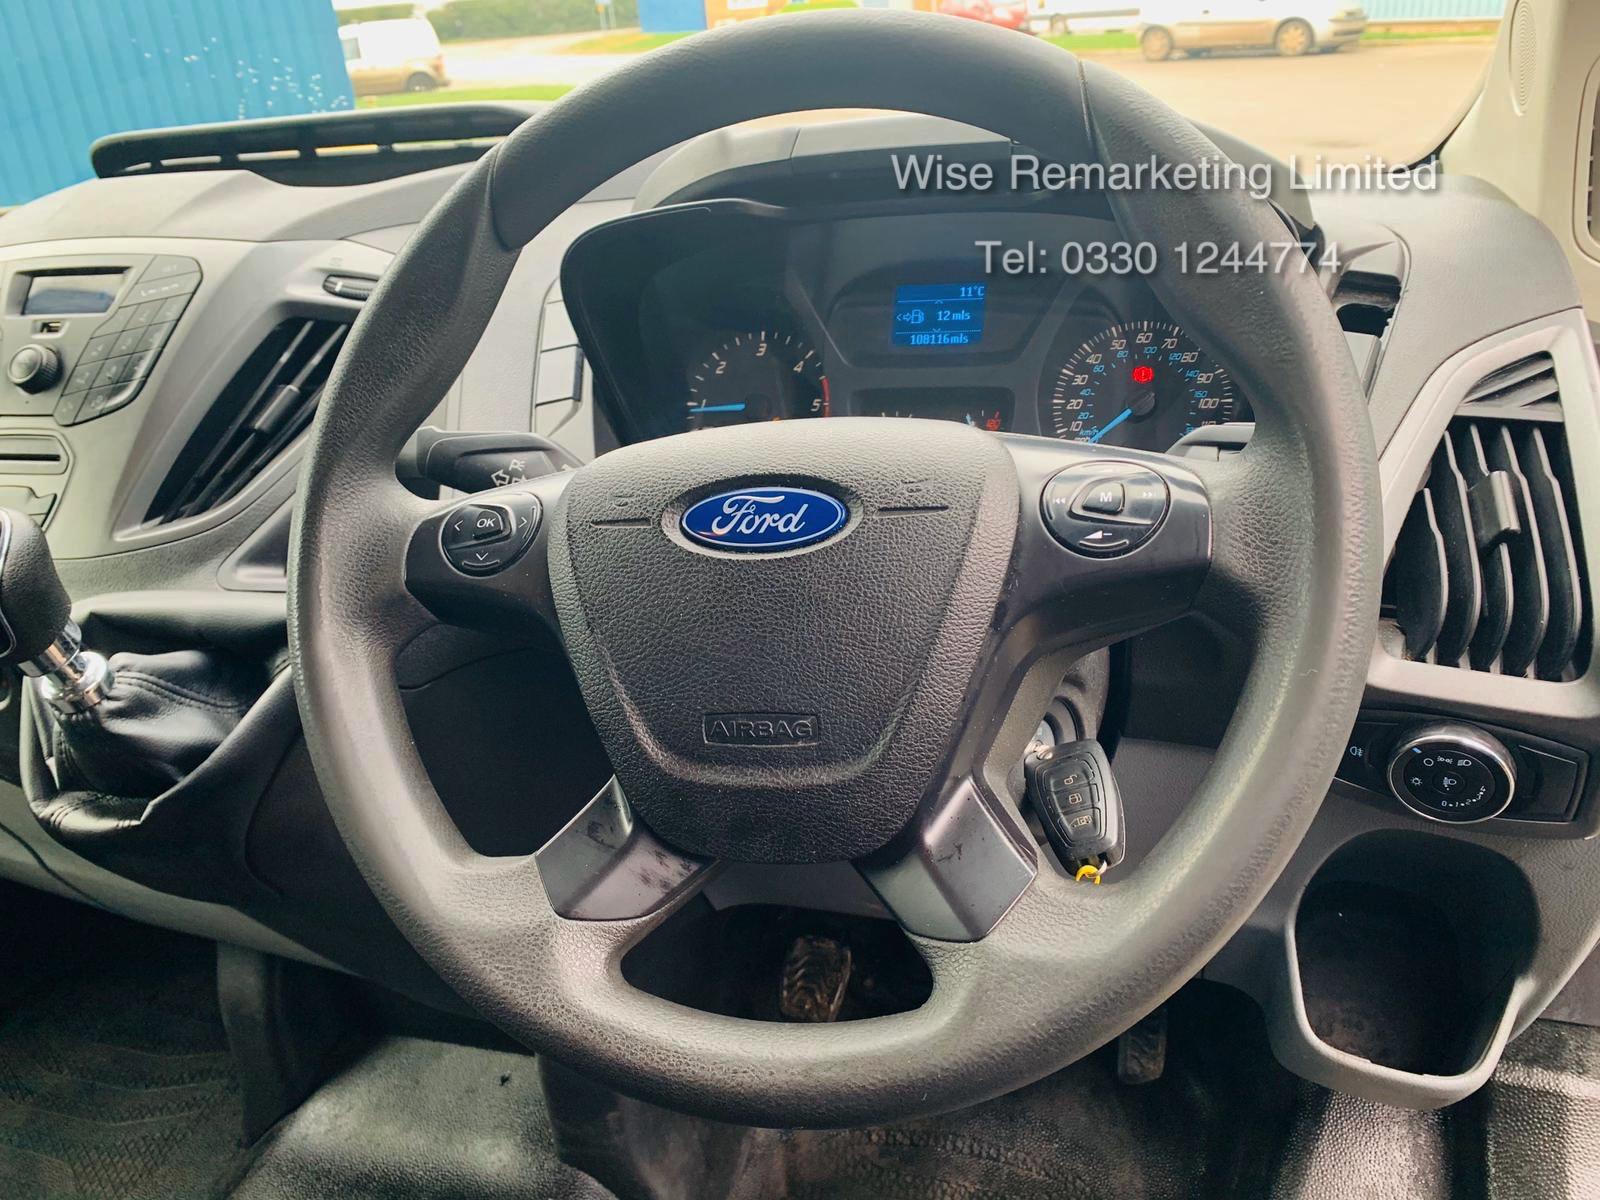 Ford Transit Custom 2.2 TDCI 290 **HIGH ROOF** - 2016 Model - AIR CON- 1 OWNER- FSH- RARE VAN!! - Image 15 of 24